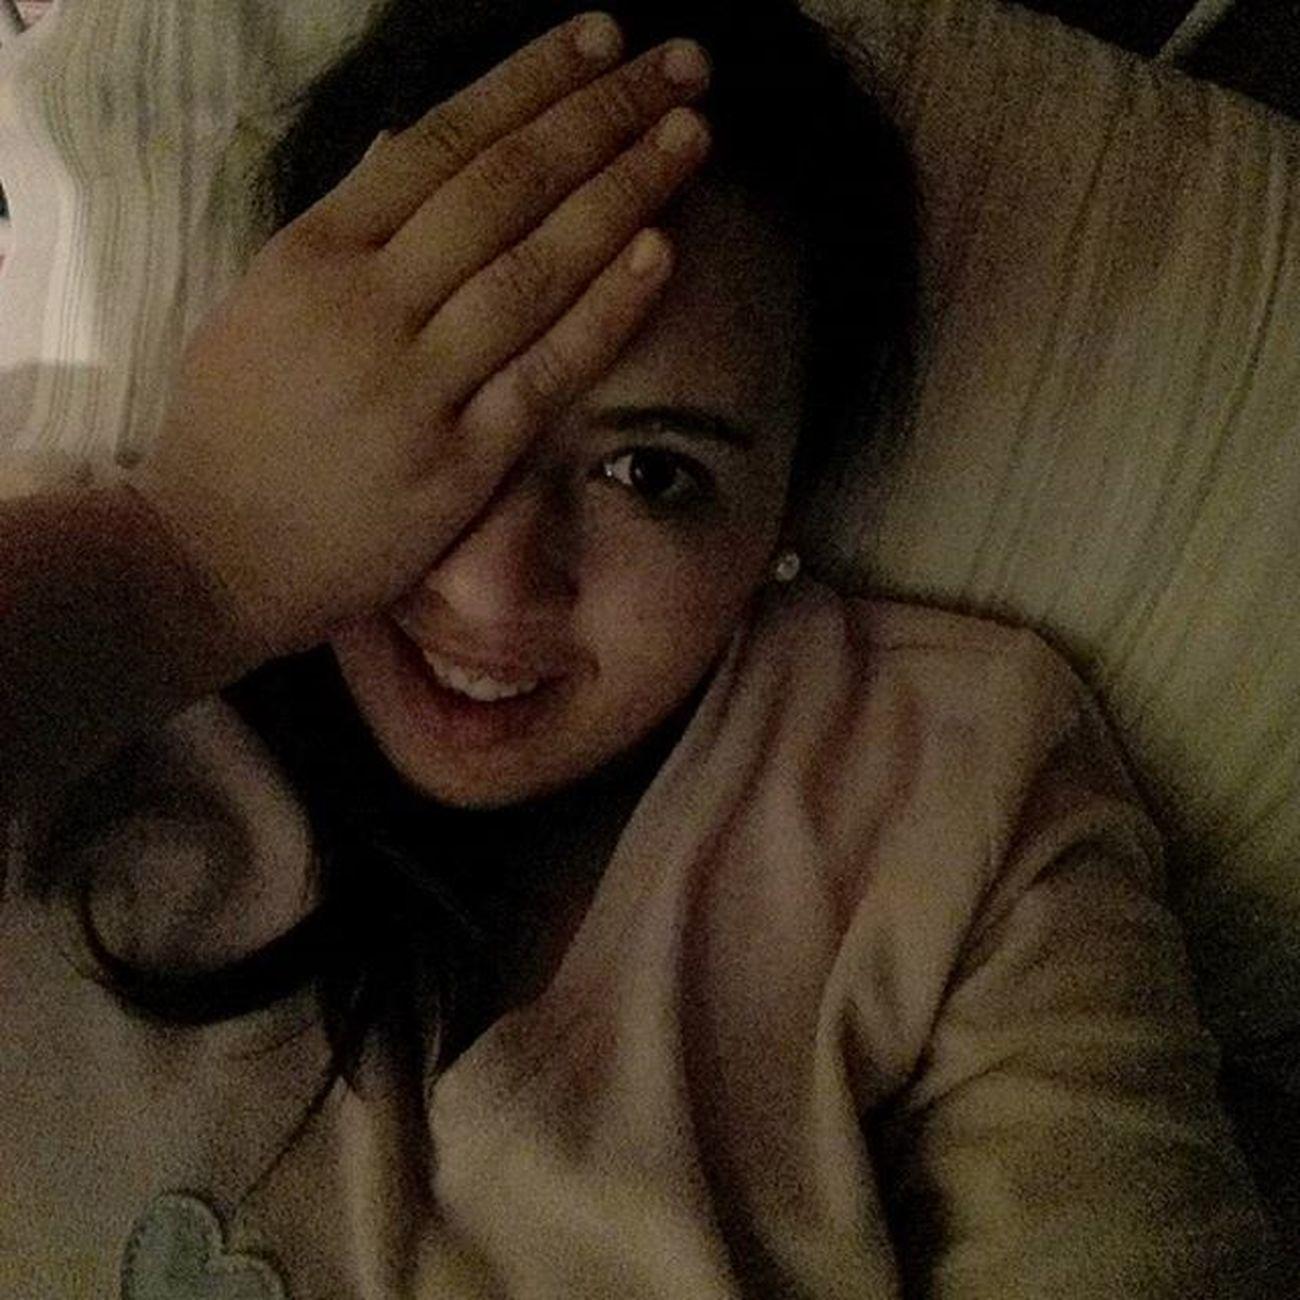 Mañana empiezo las practicas y estoy un poquitin nerviosa ;-) Selfie Selfienation Selfies Me Love Pretty Instagood Instaselfie Selfietime Face Life Fun Followme Instalove Smile Eyes Follow